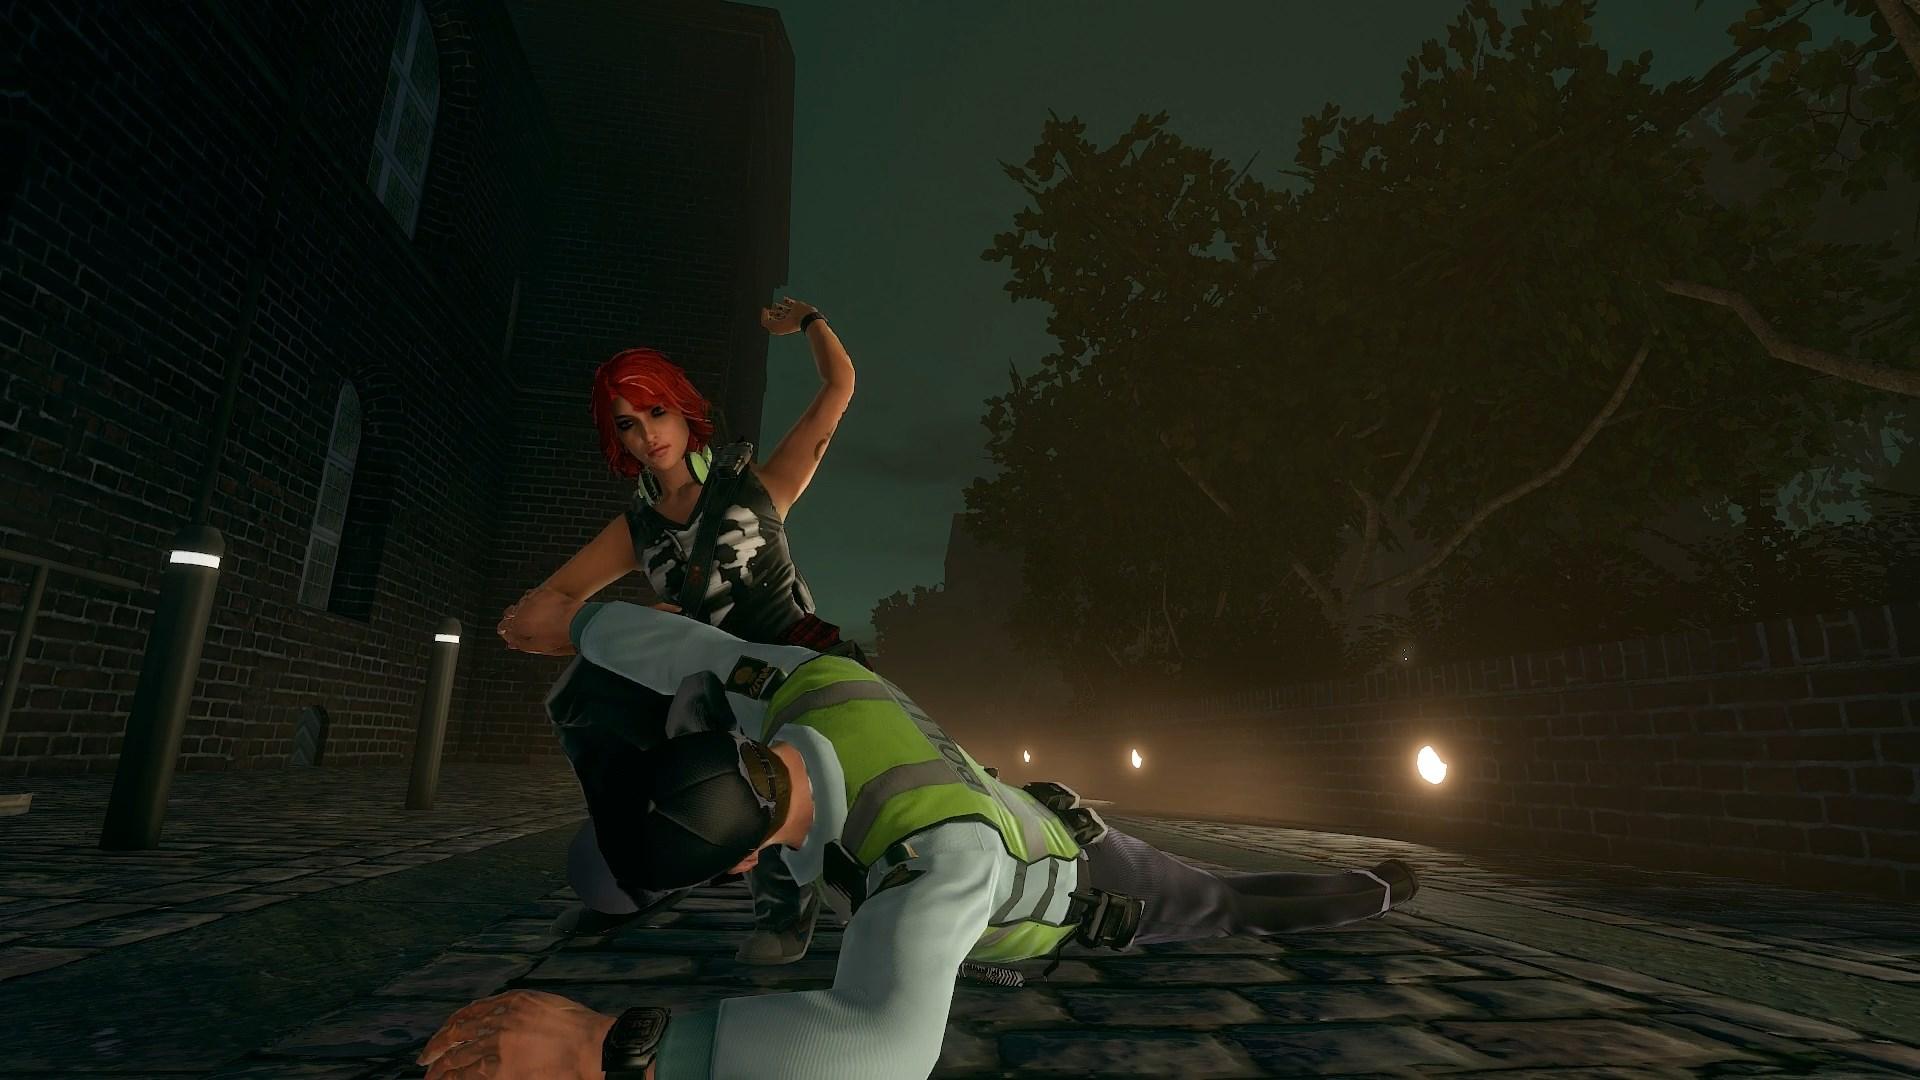 Clandestine Screenshot 3